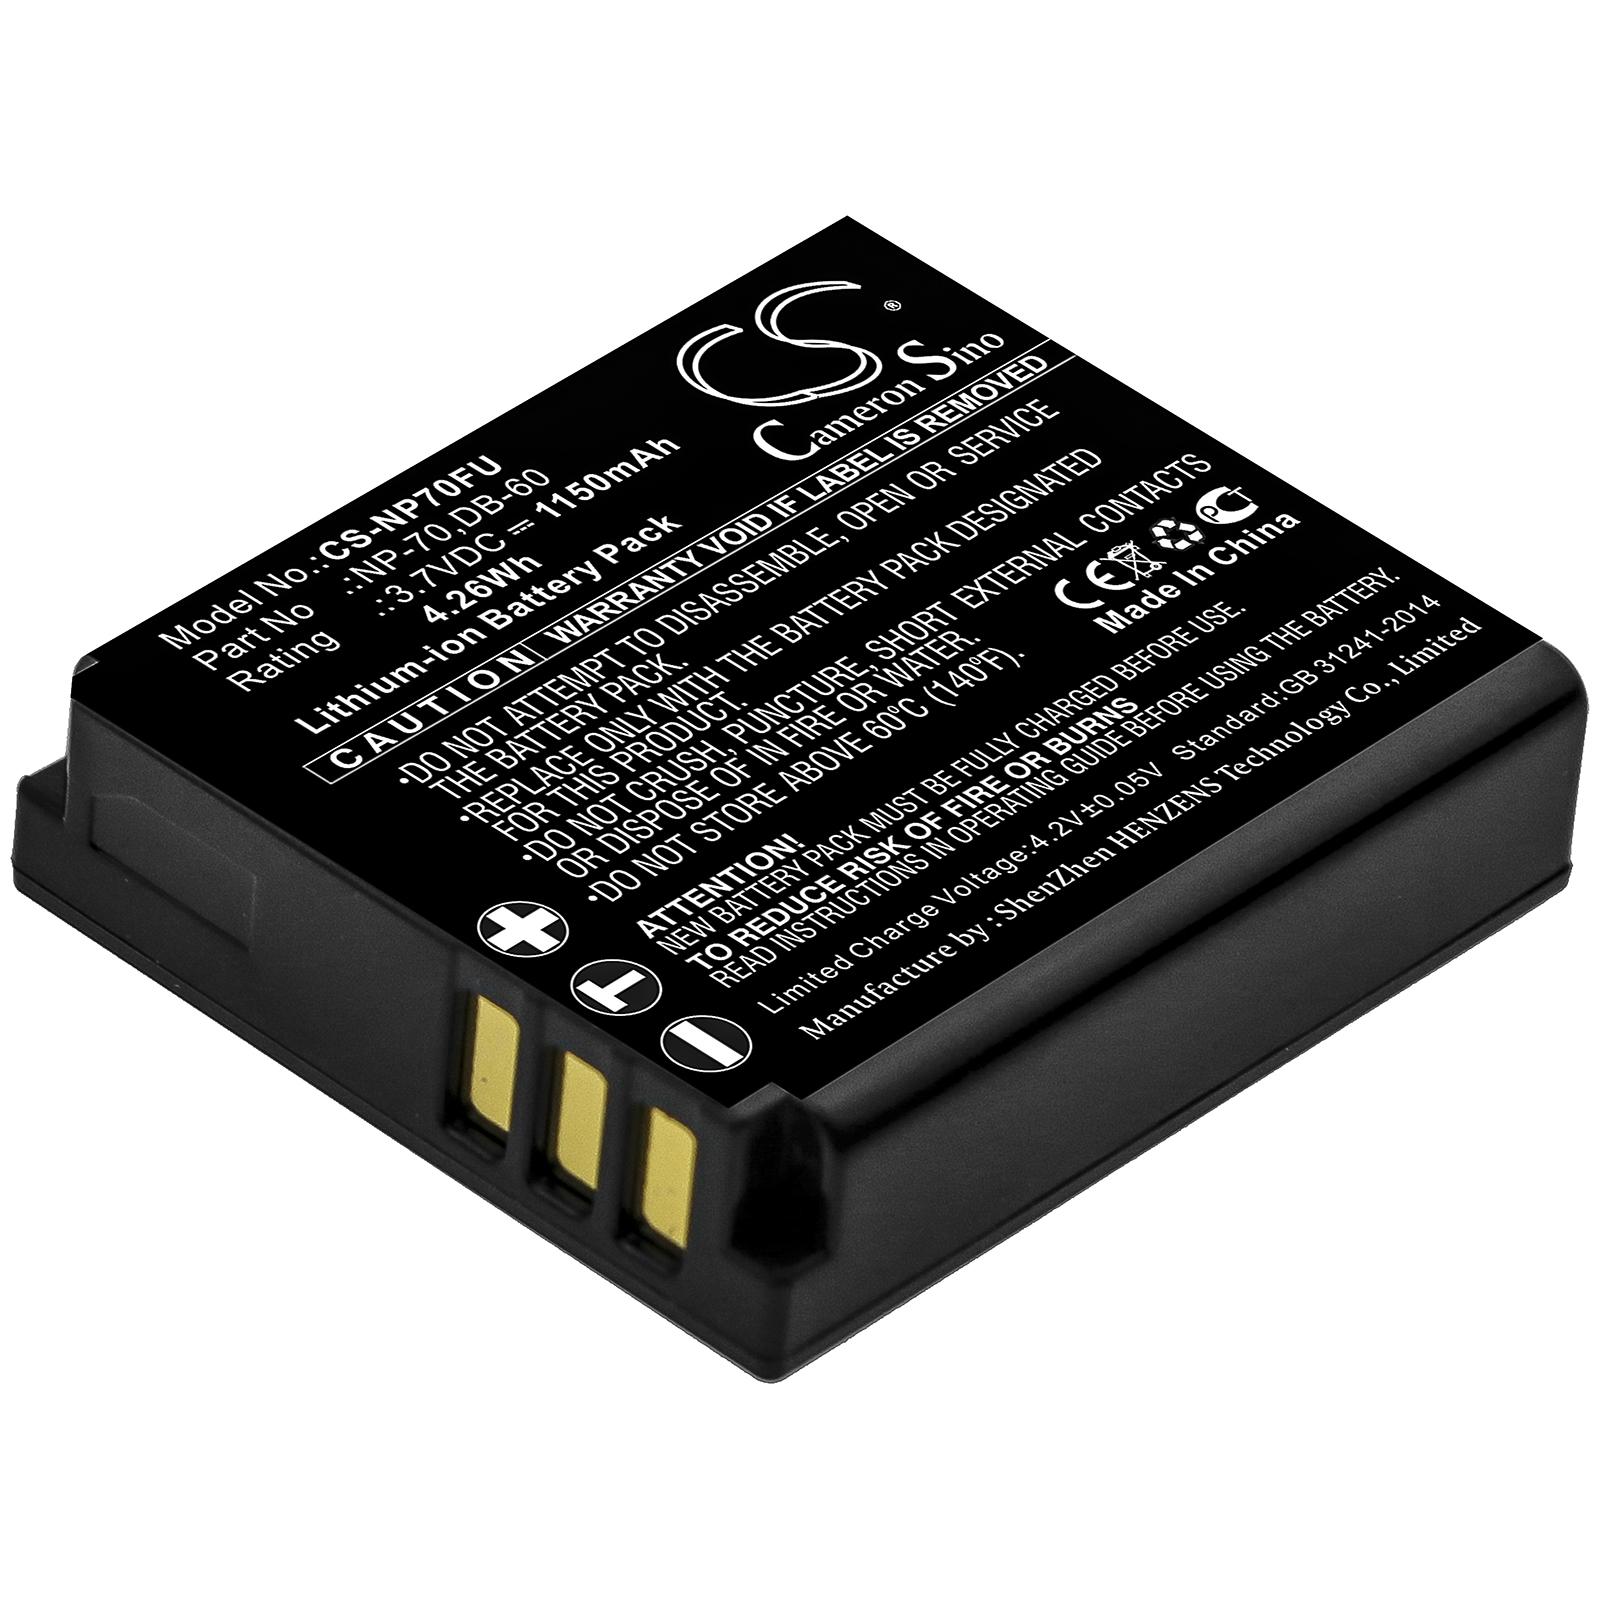 Akku-Batteria-1150mAh-fuer-PANASONIC-Lumix-DMC-FX07S-DMC-FX10-DMC-FX100EF-K